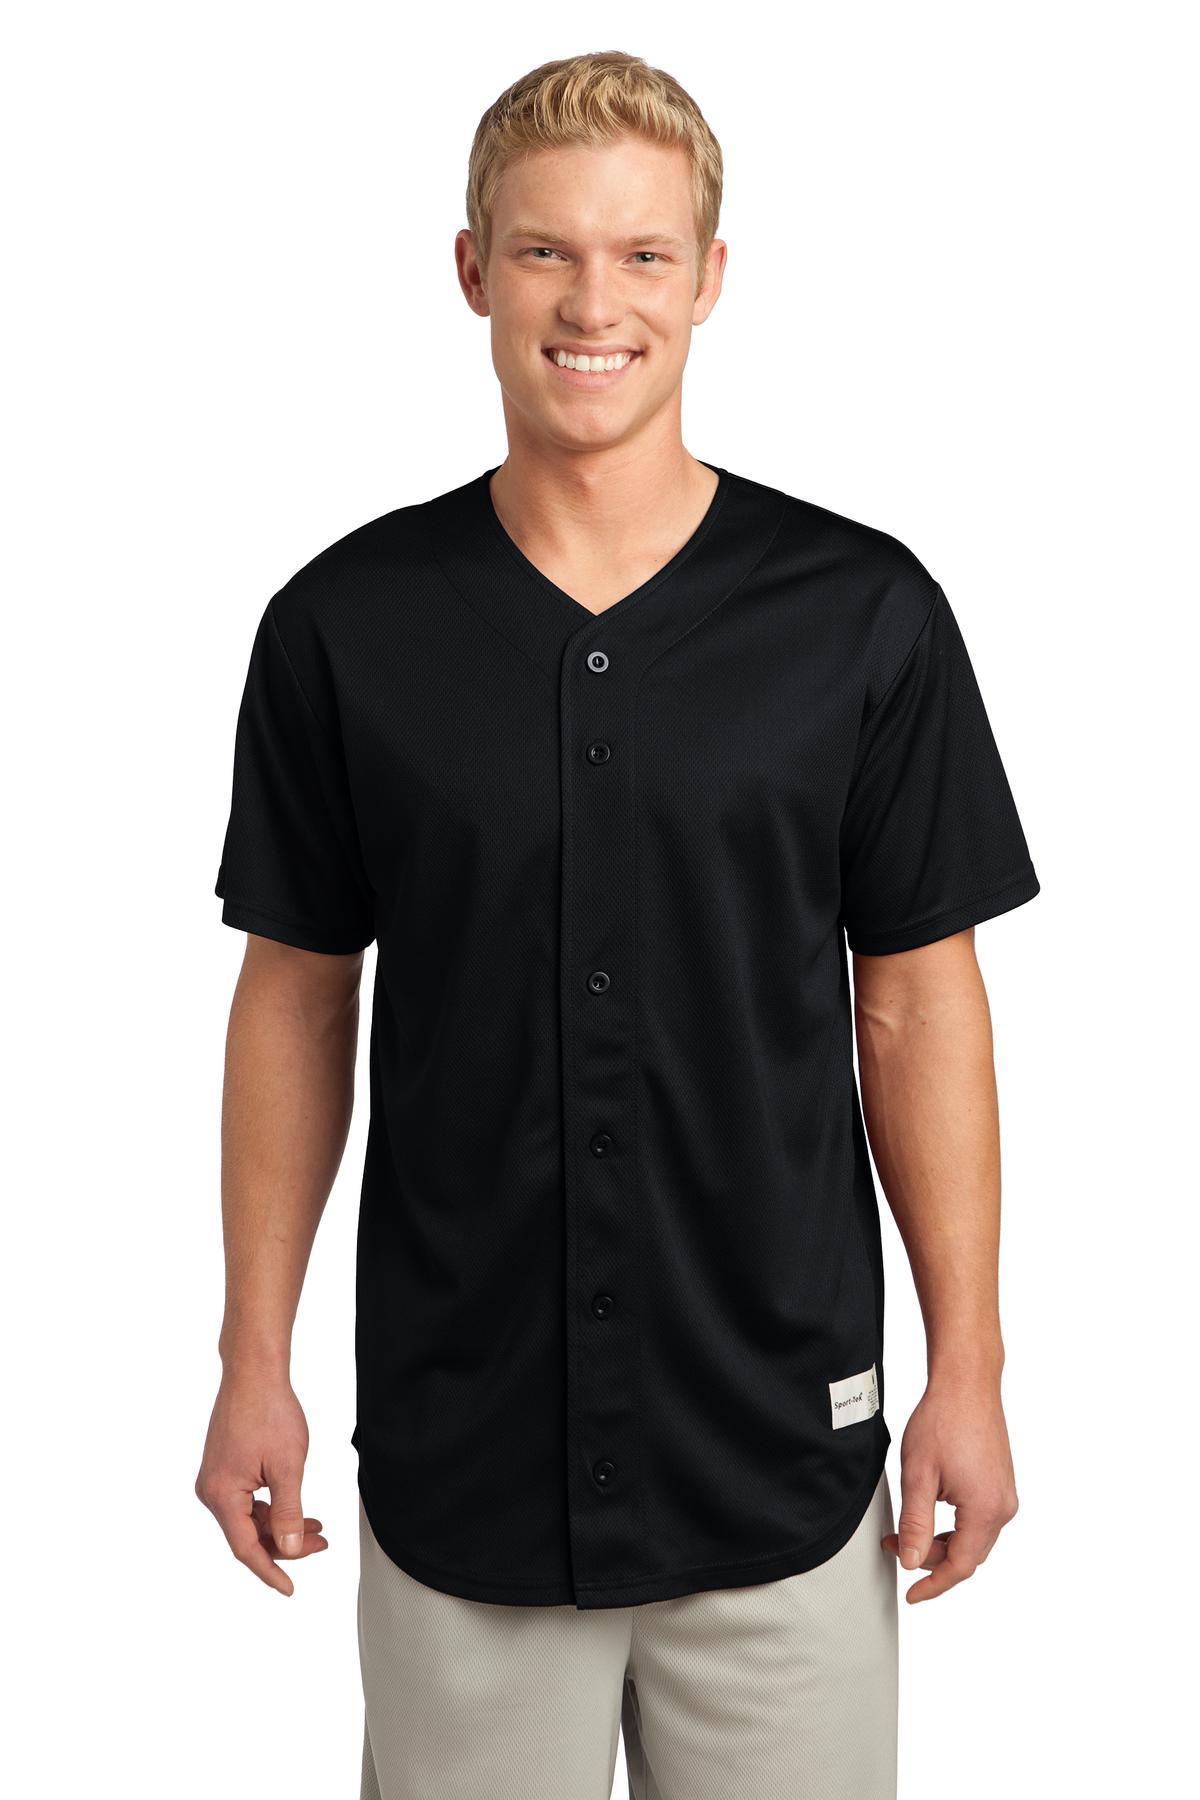 T-Shirts-Performance-23